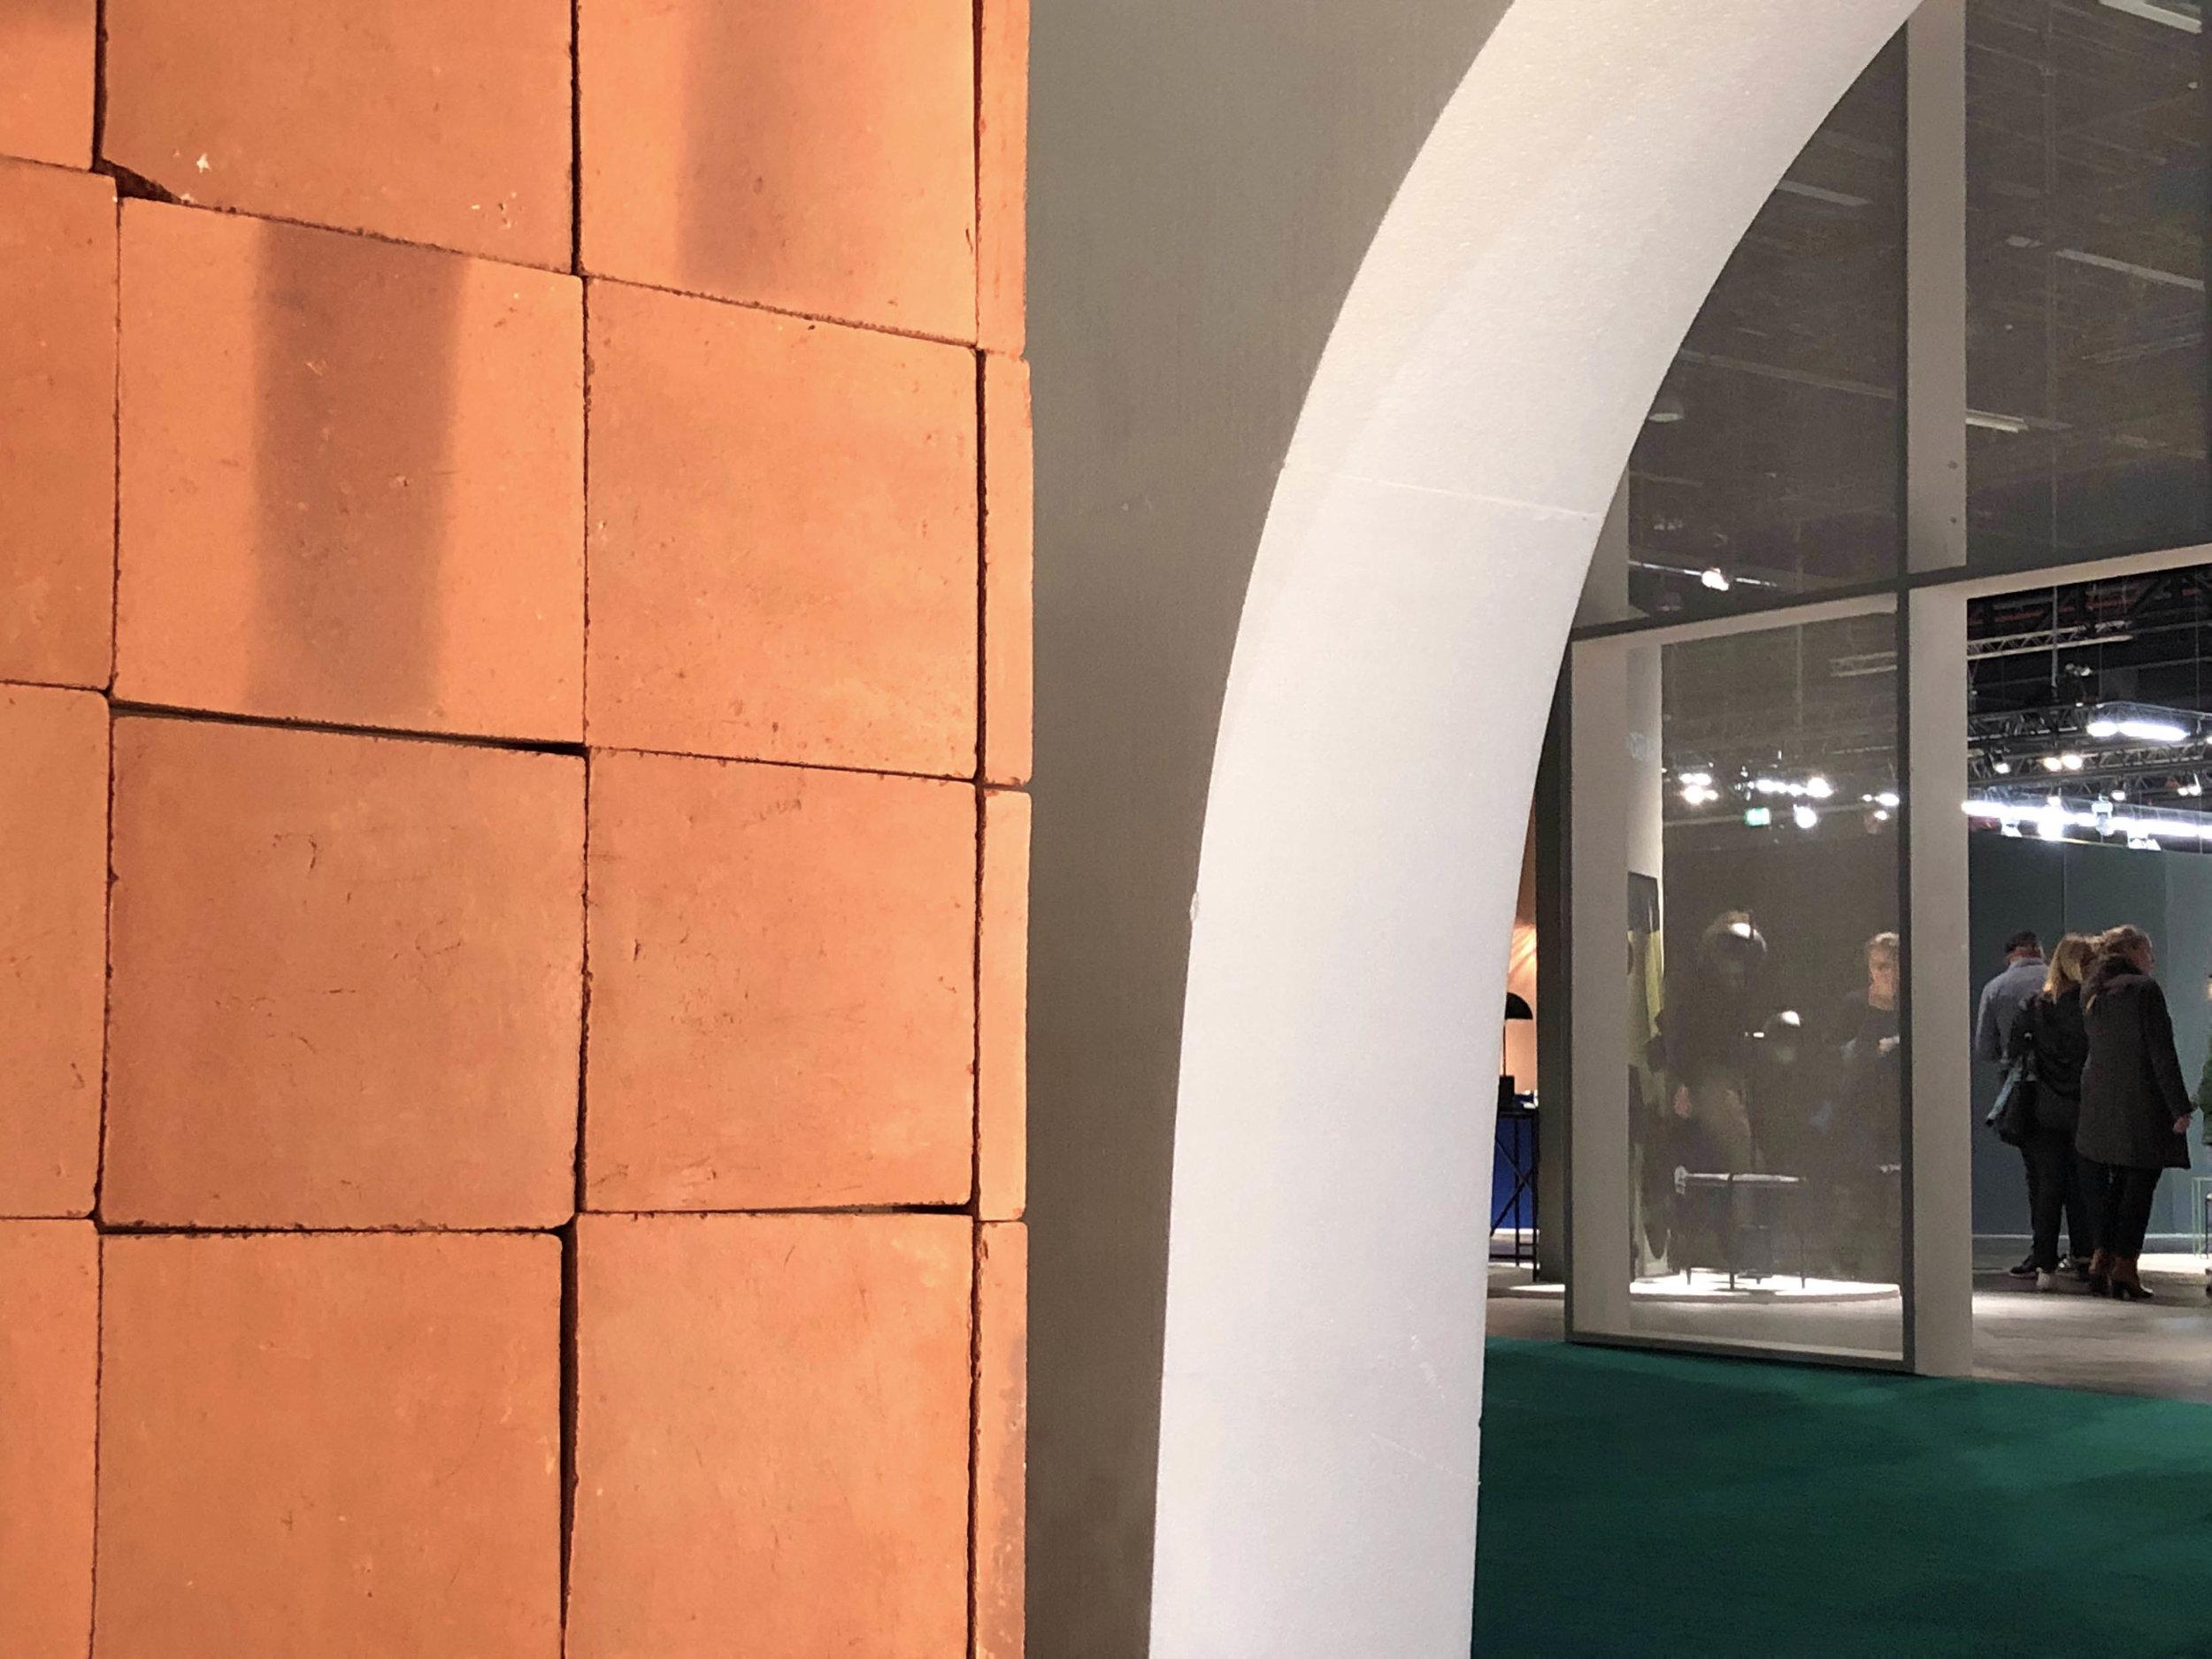 Raams-Architecture-Design-Studio-Geofood-Interieur-Biennale-Kortrijk-Belgium-design-award-restaurant-installation-exhibition-04s.jpg